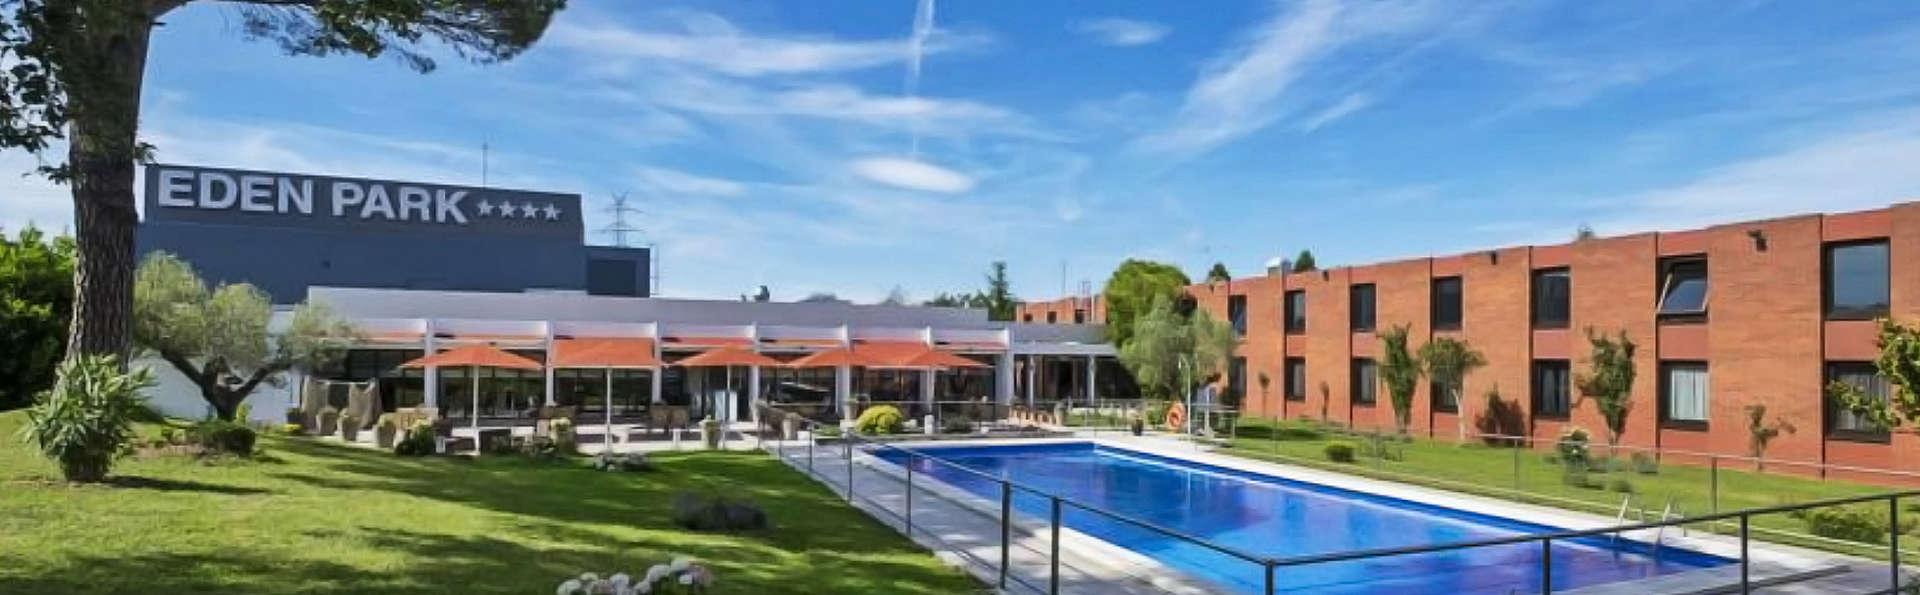 Hotel Eden Park - edit_piscina_facade.jpg